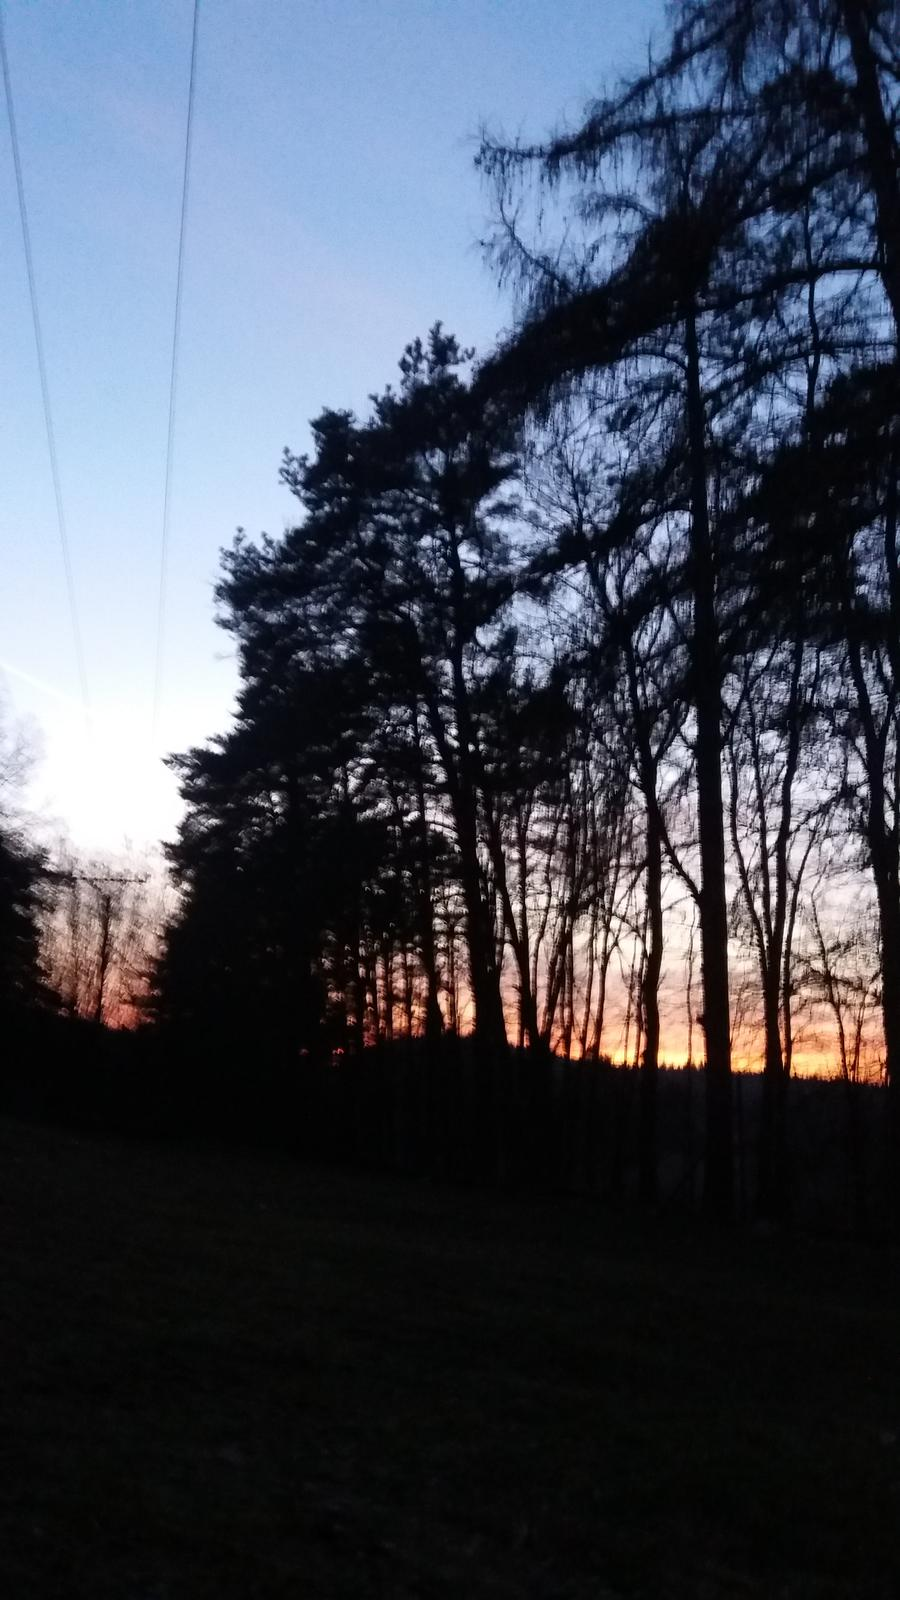 Rok 2017 u nás a po našem.... - Dnes byl krásný západ slunce u nás..☺